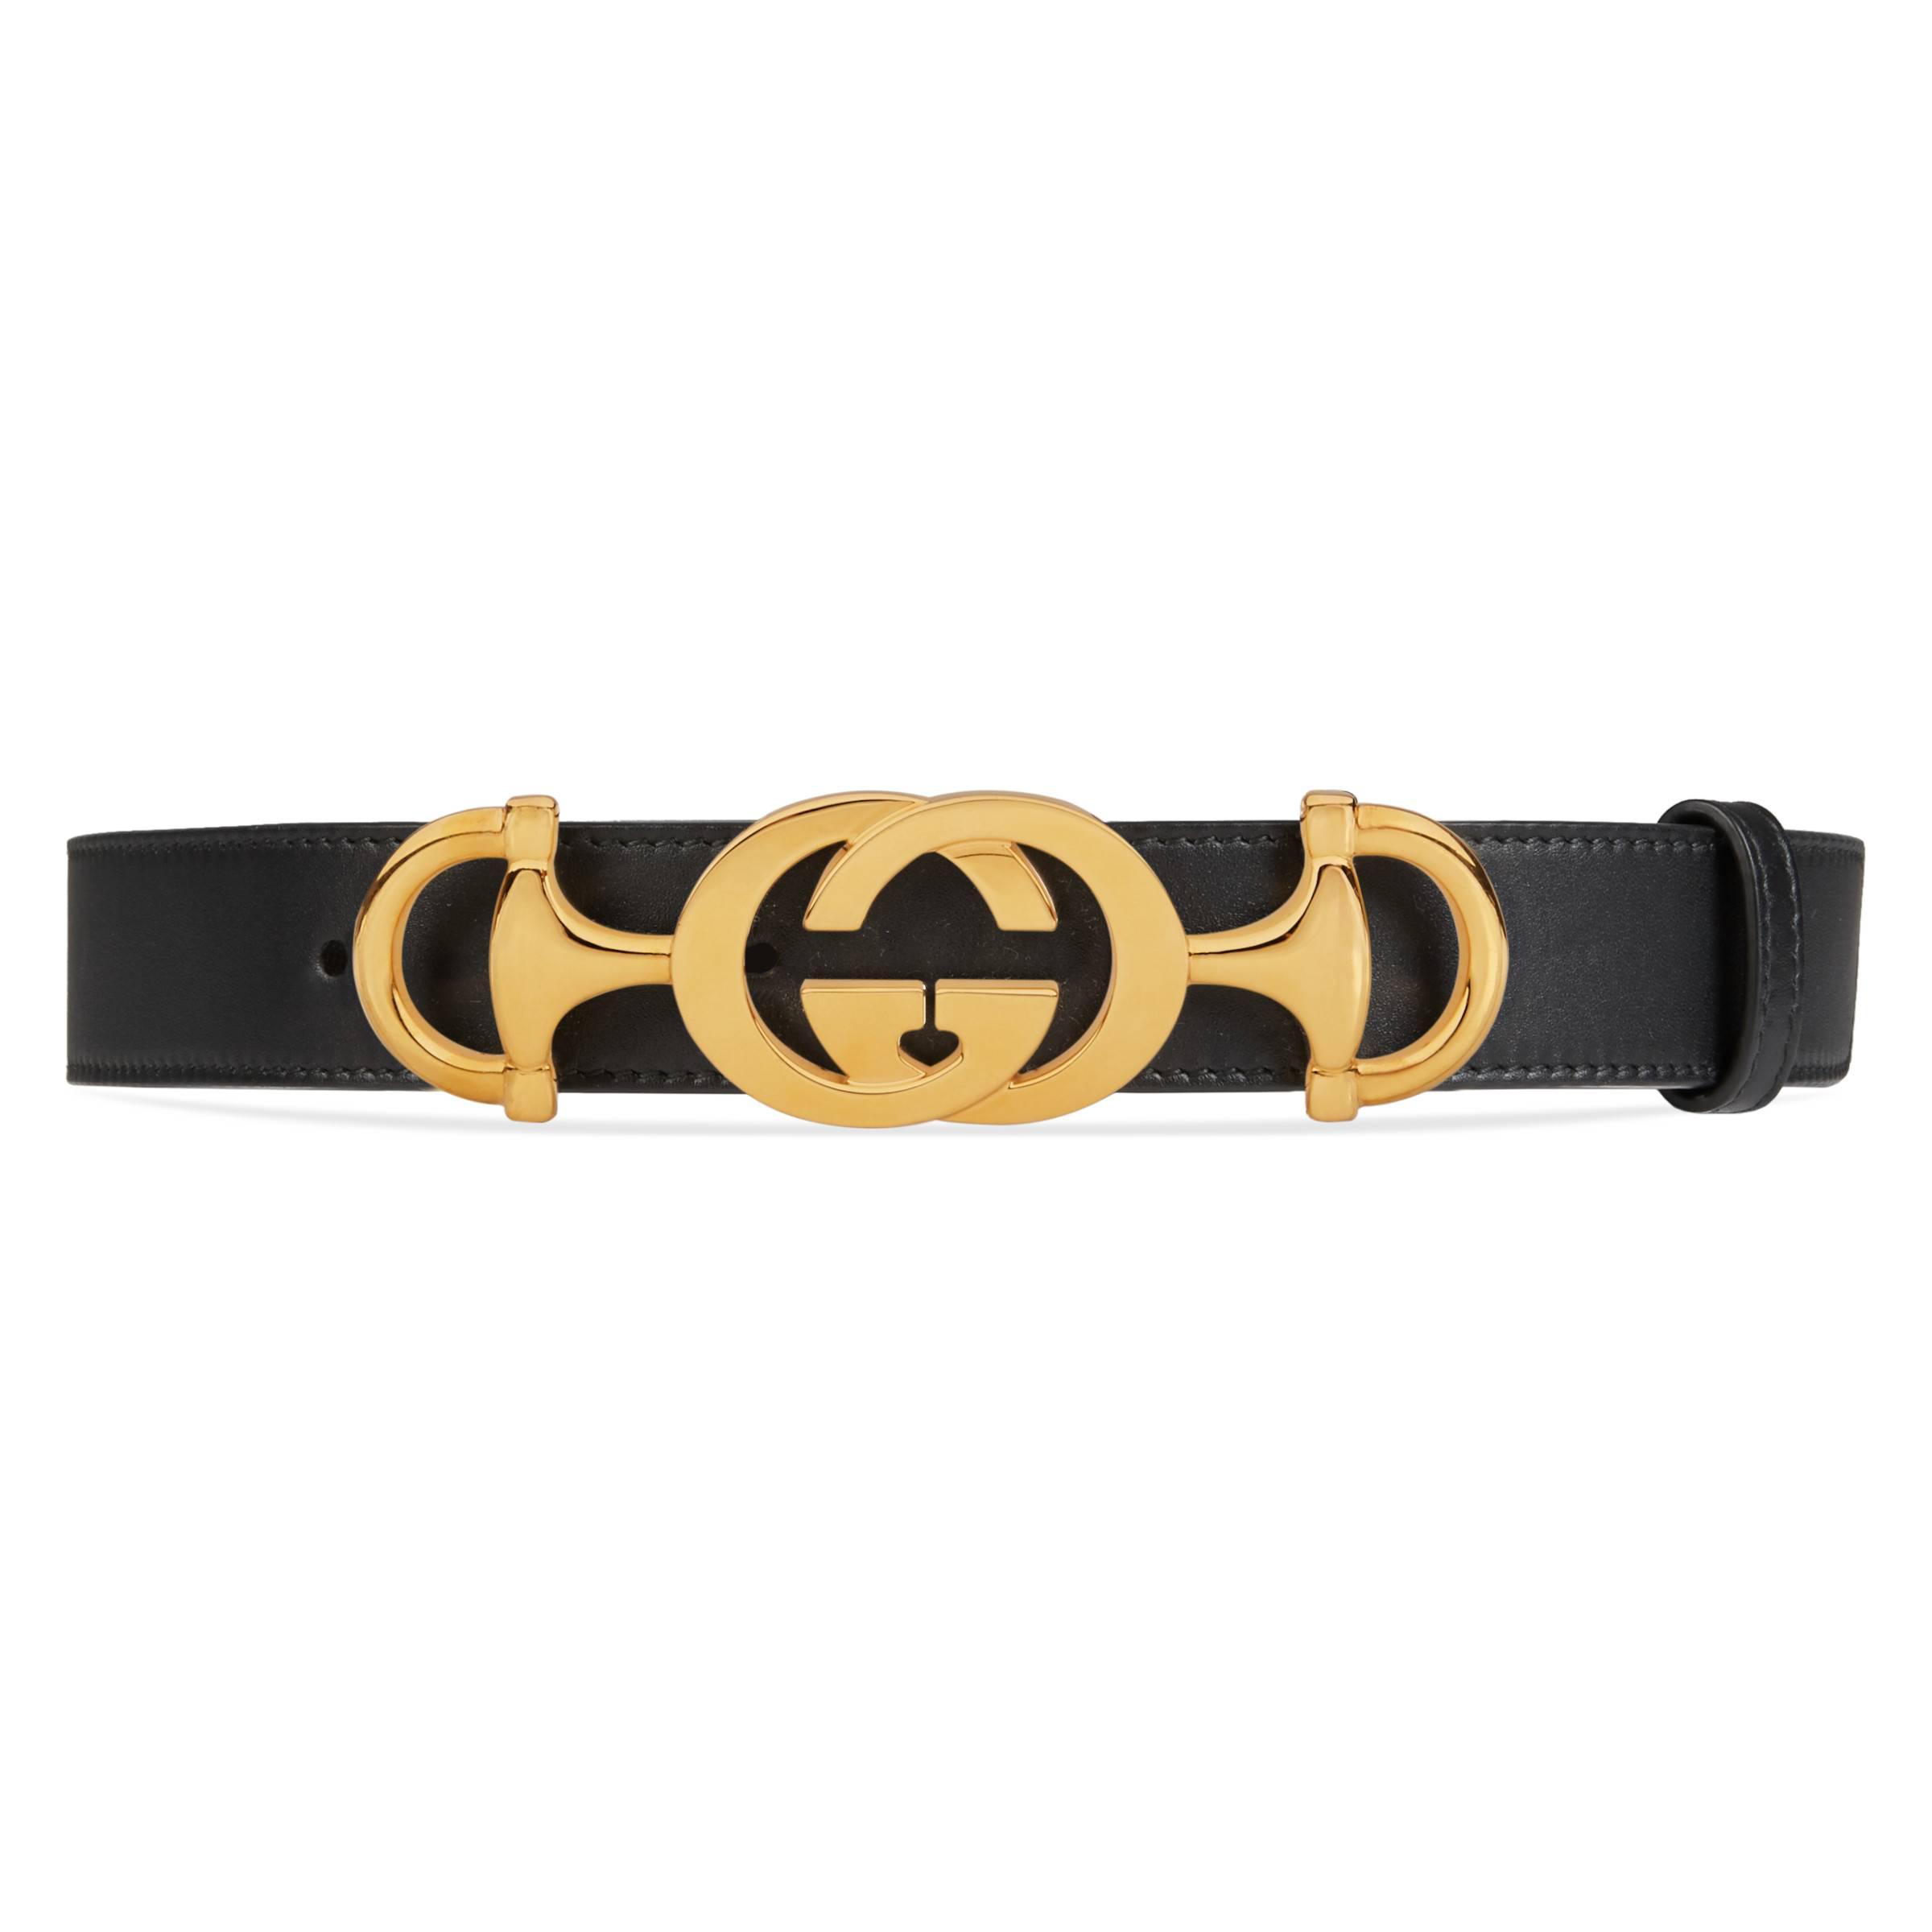 16db3aef293a Gucci Leather Belt With Interlocking G Horsebit in Black - Save 29 ...